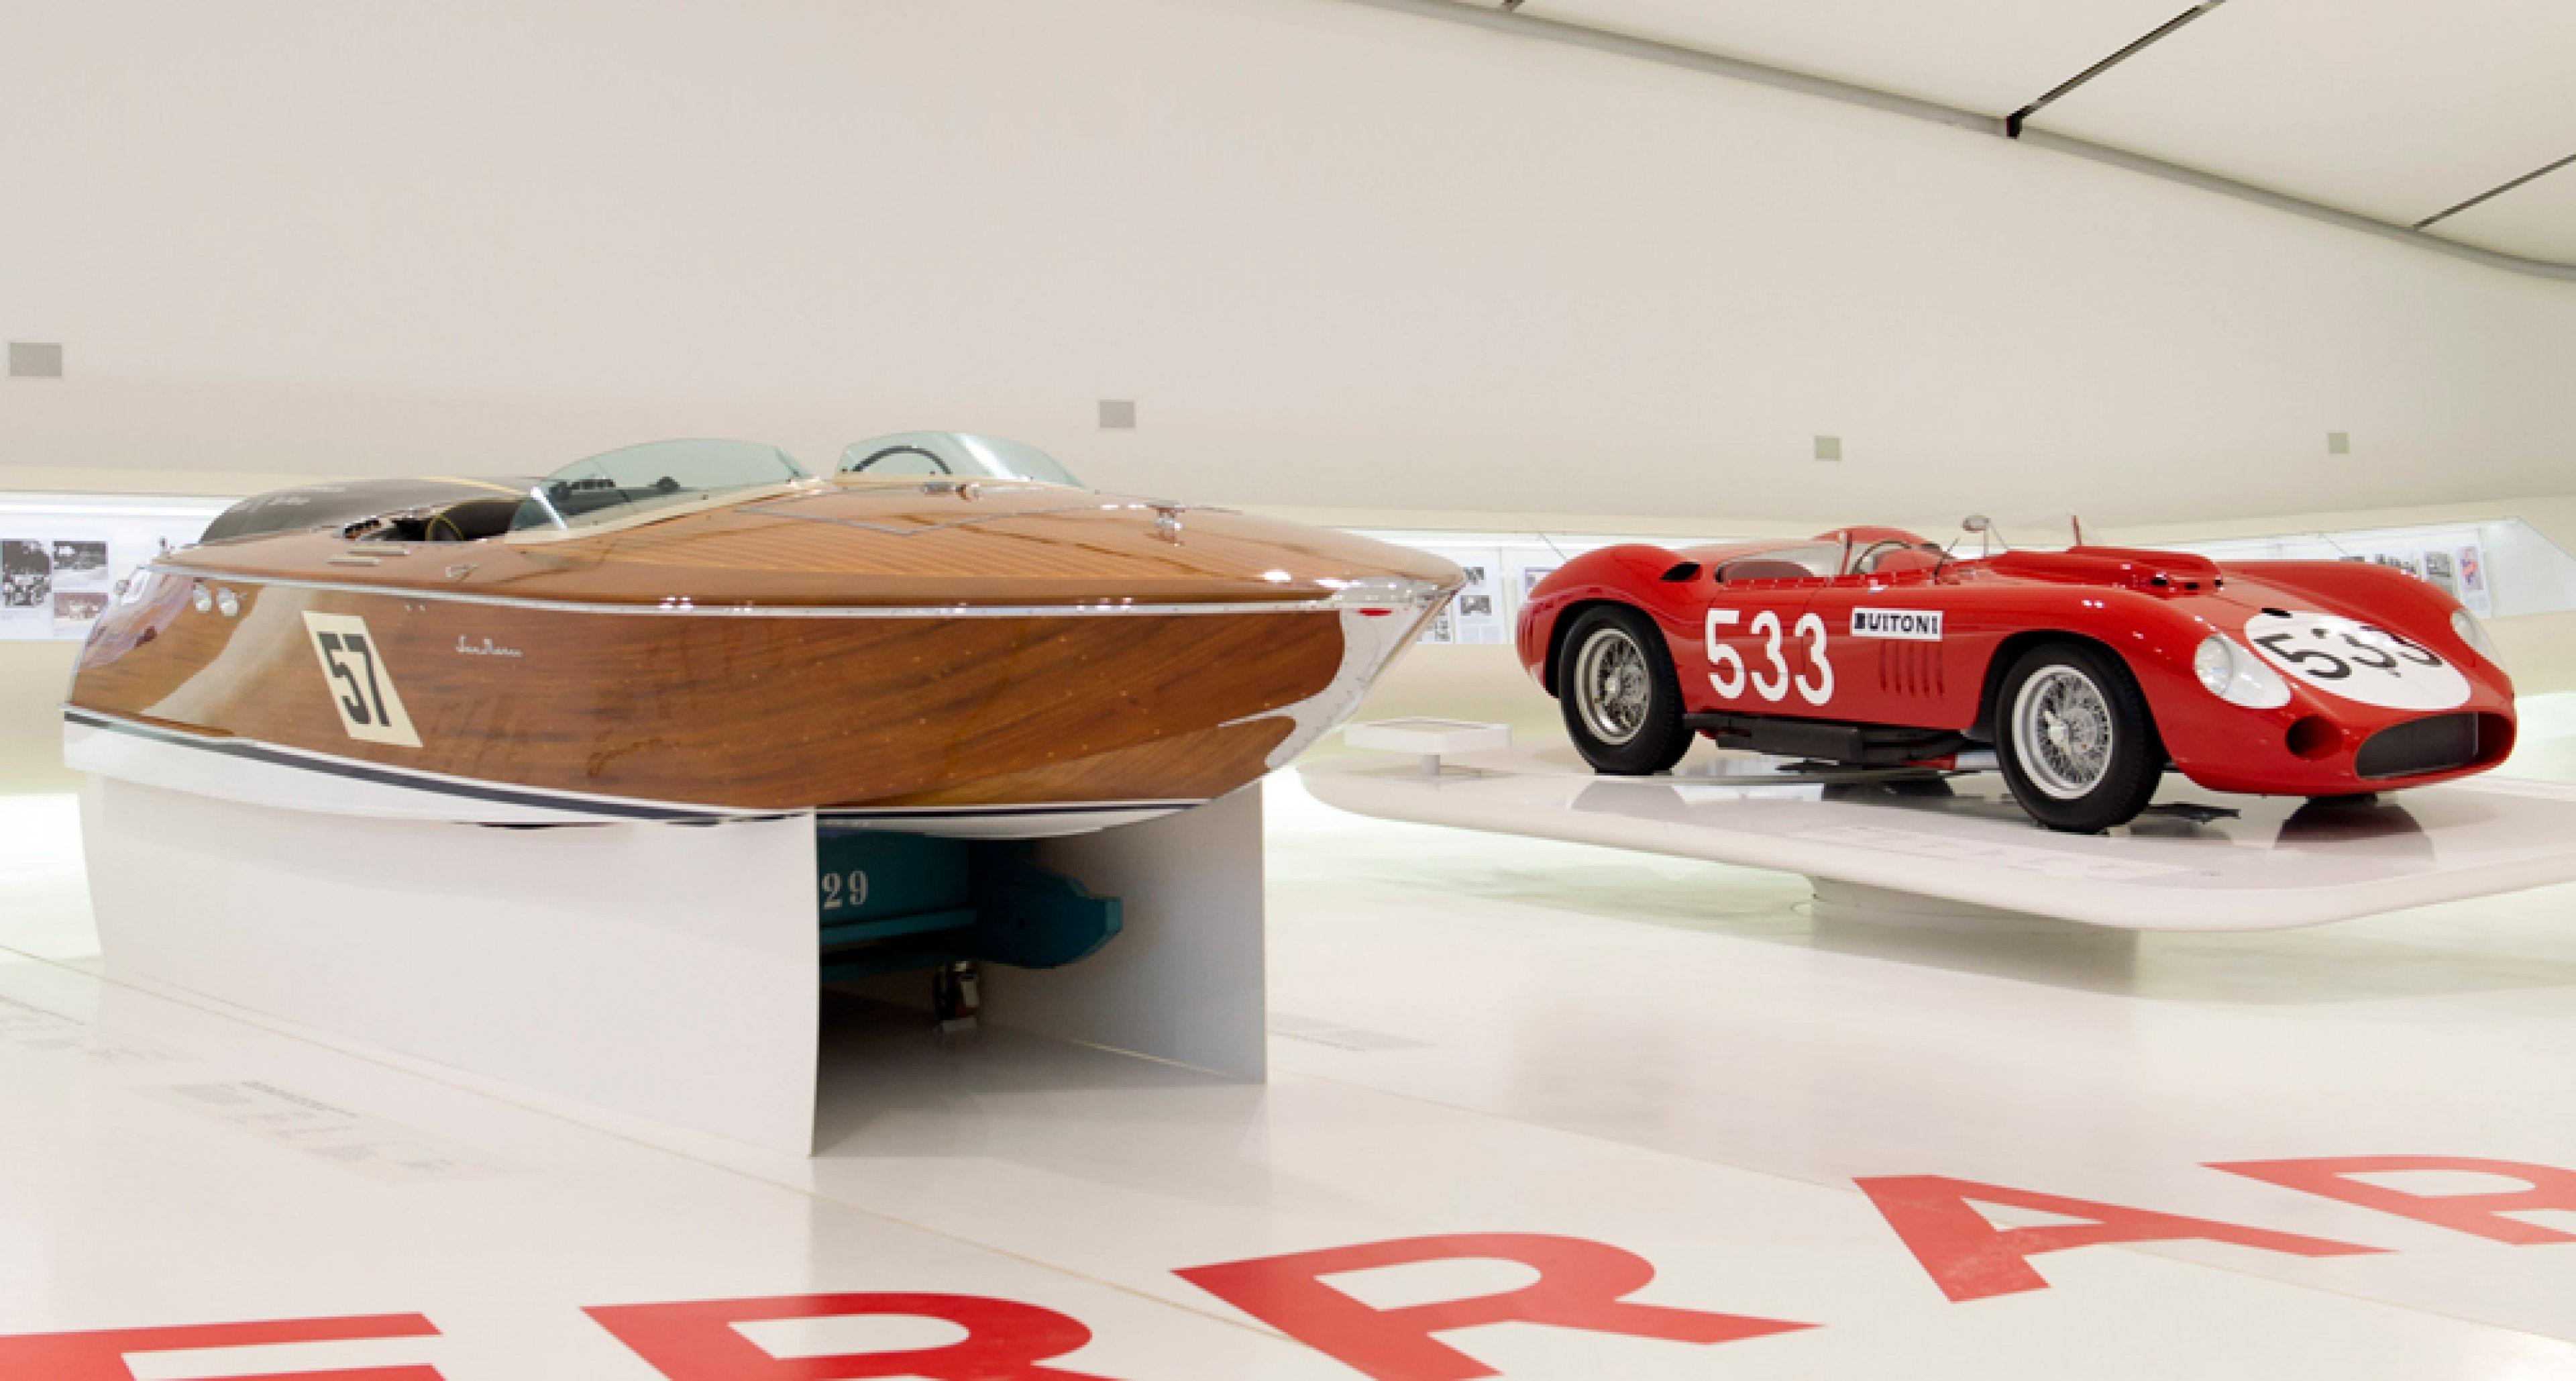 San Marco Maserati boat on display at Museo Cases Enzo Ferrari last year